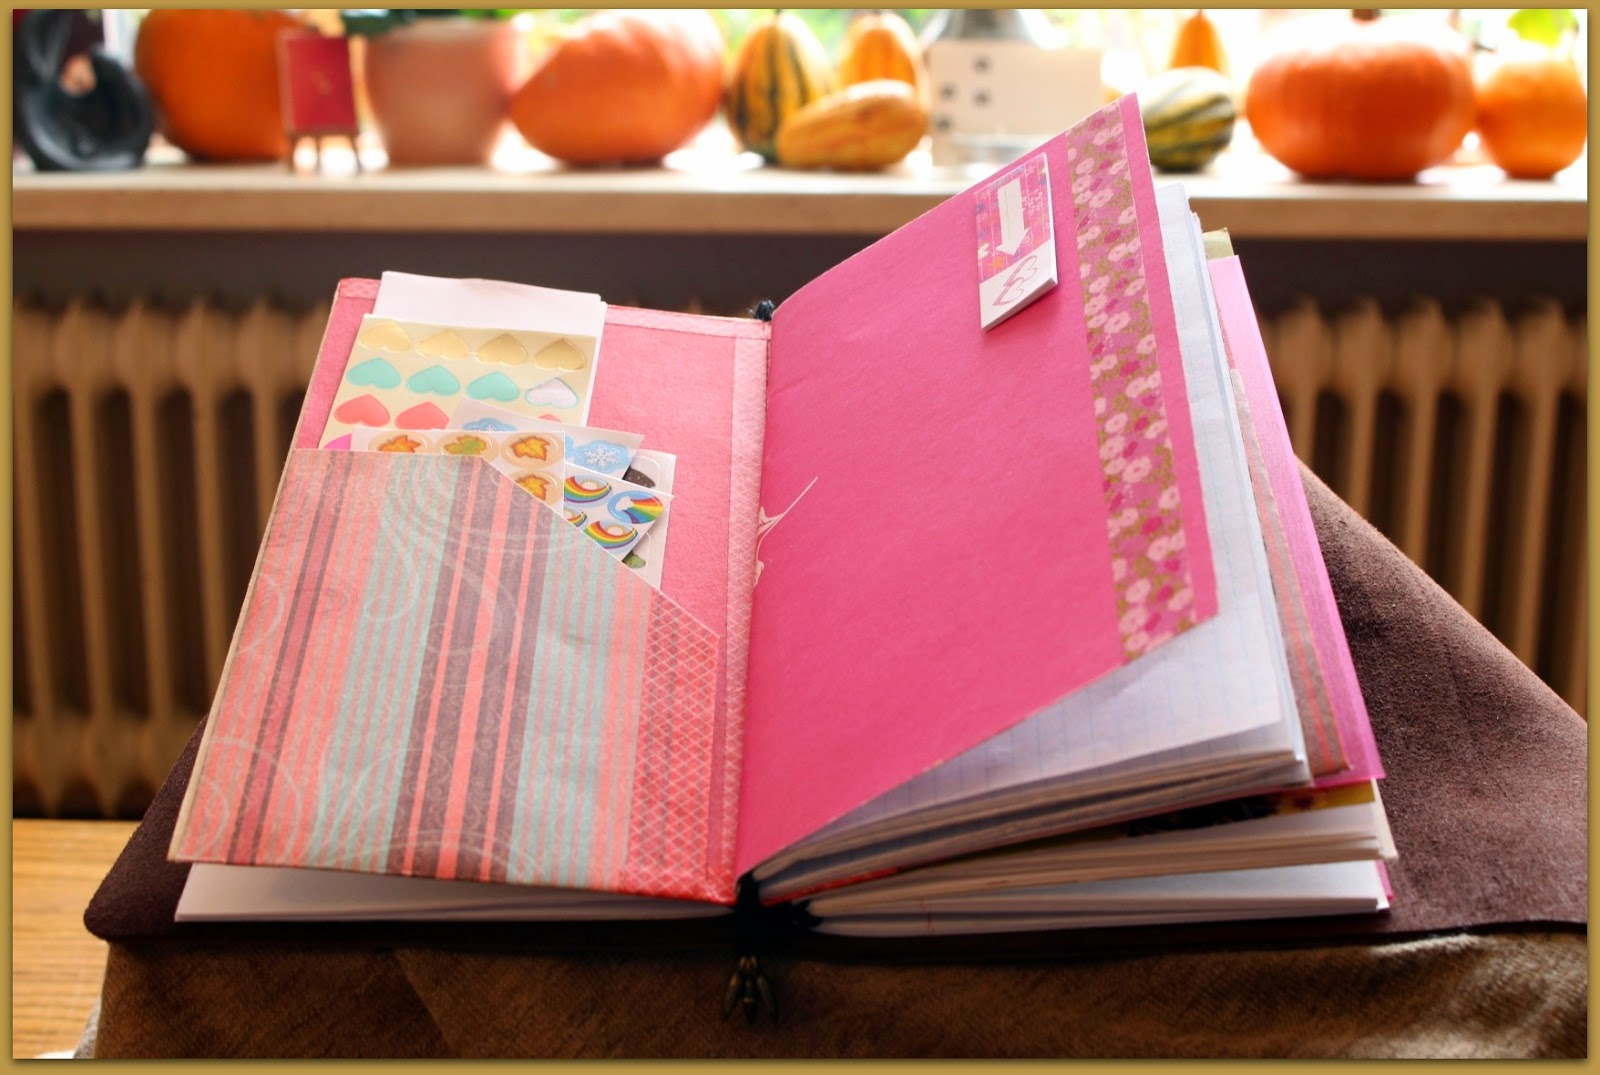 Midori fauxdori Travelers Notebook regular size open folder